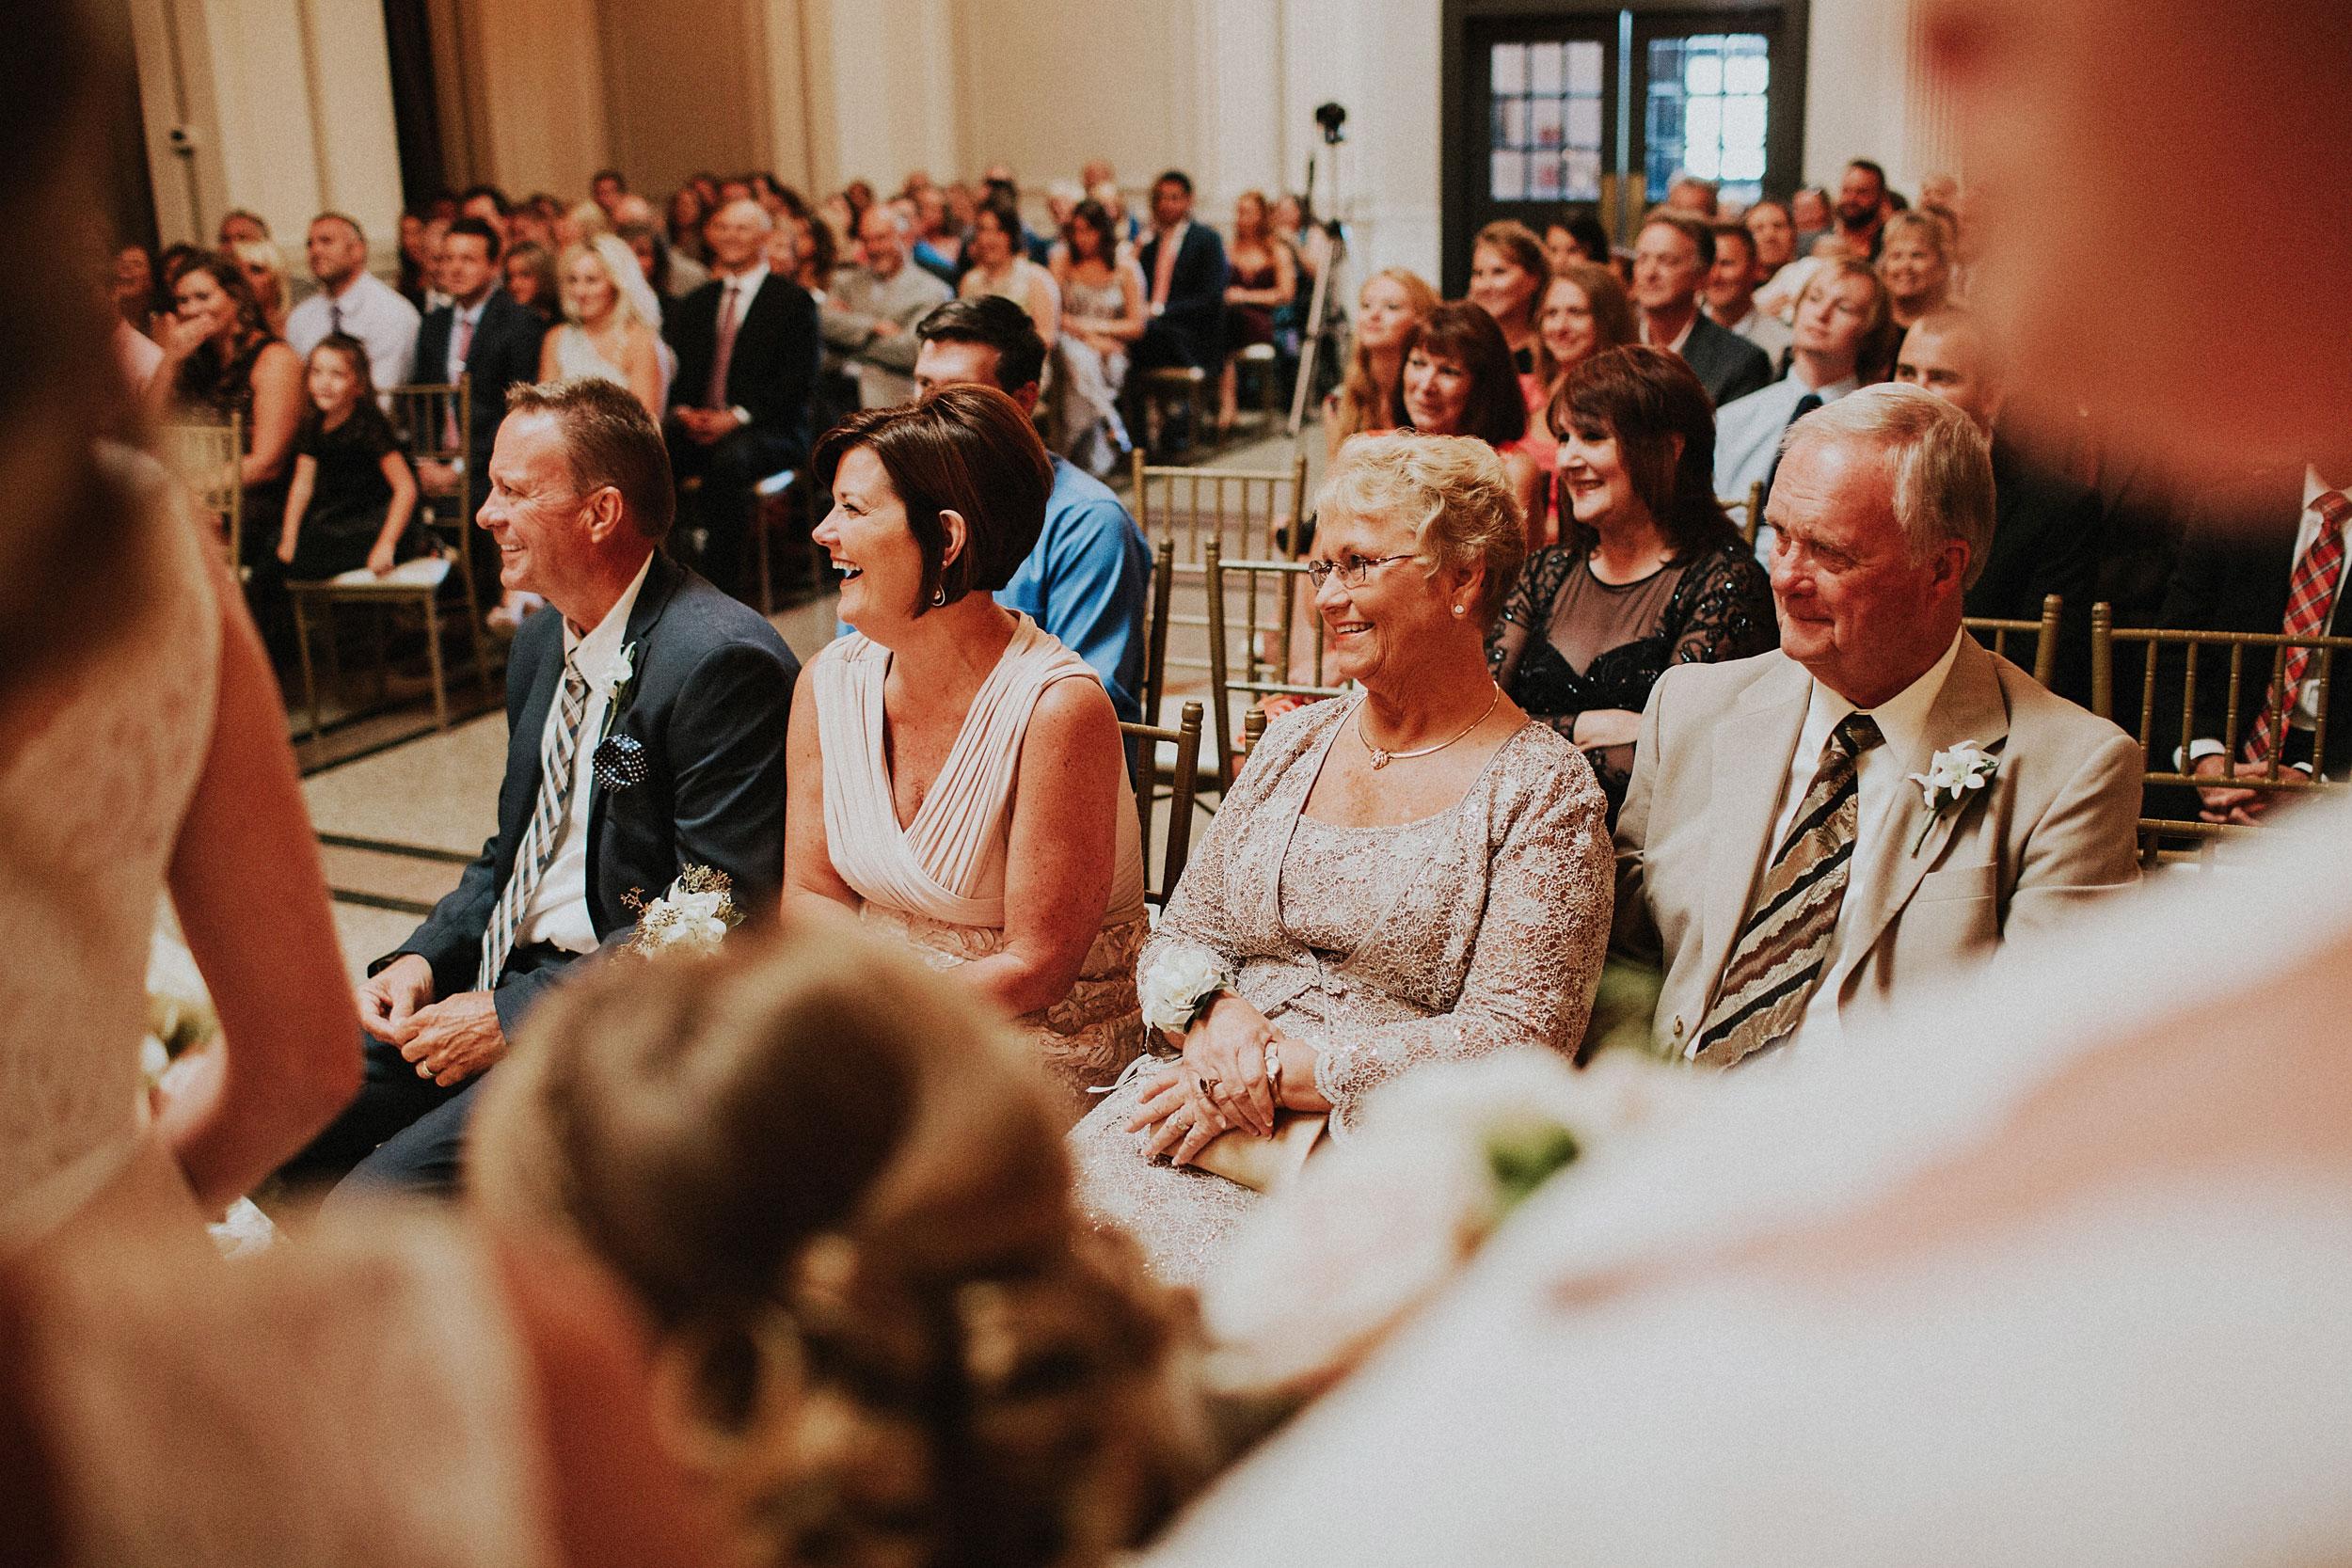 olmsted-wedding-louisville-kentucky-025.JPG